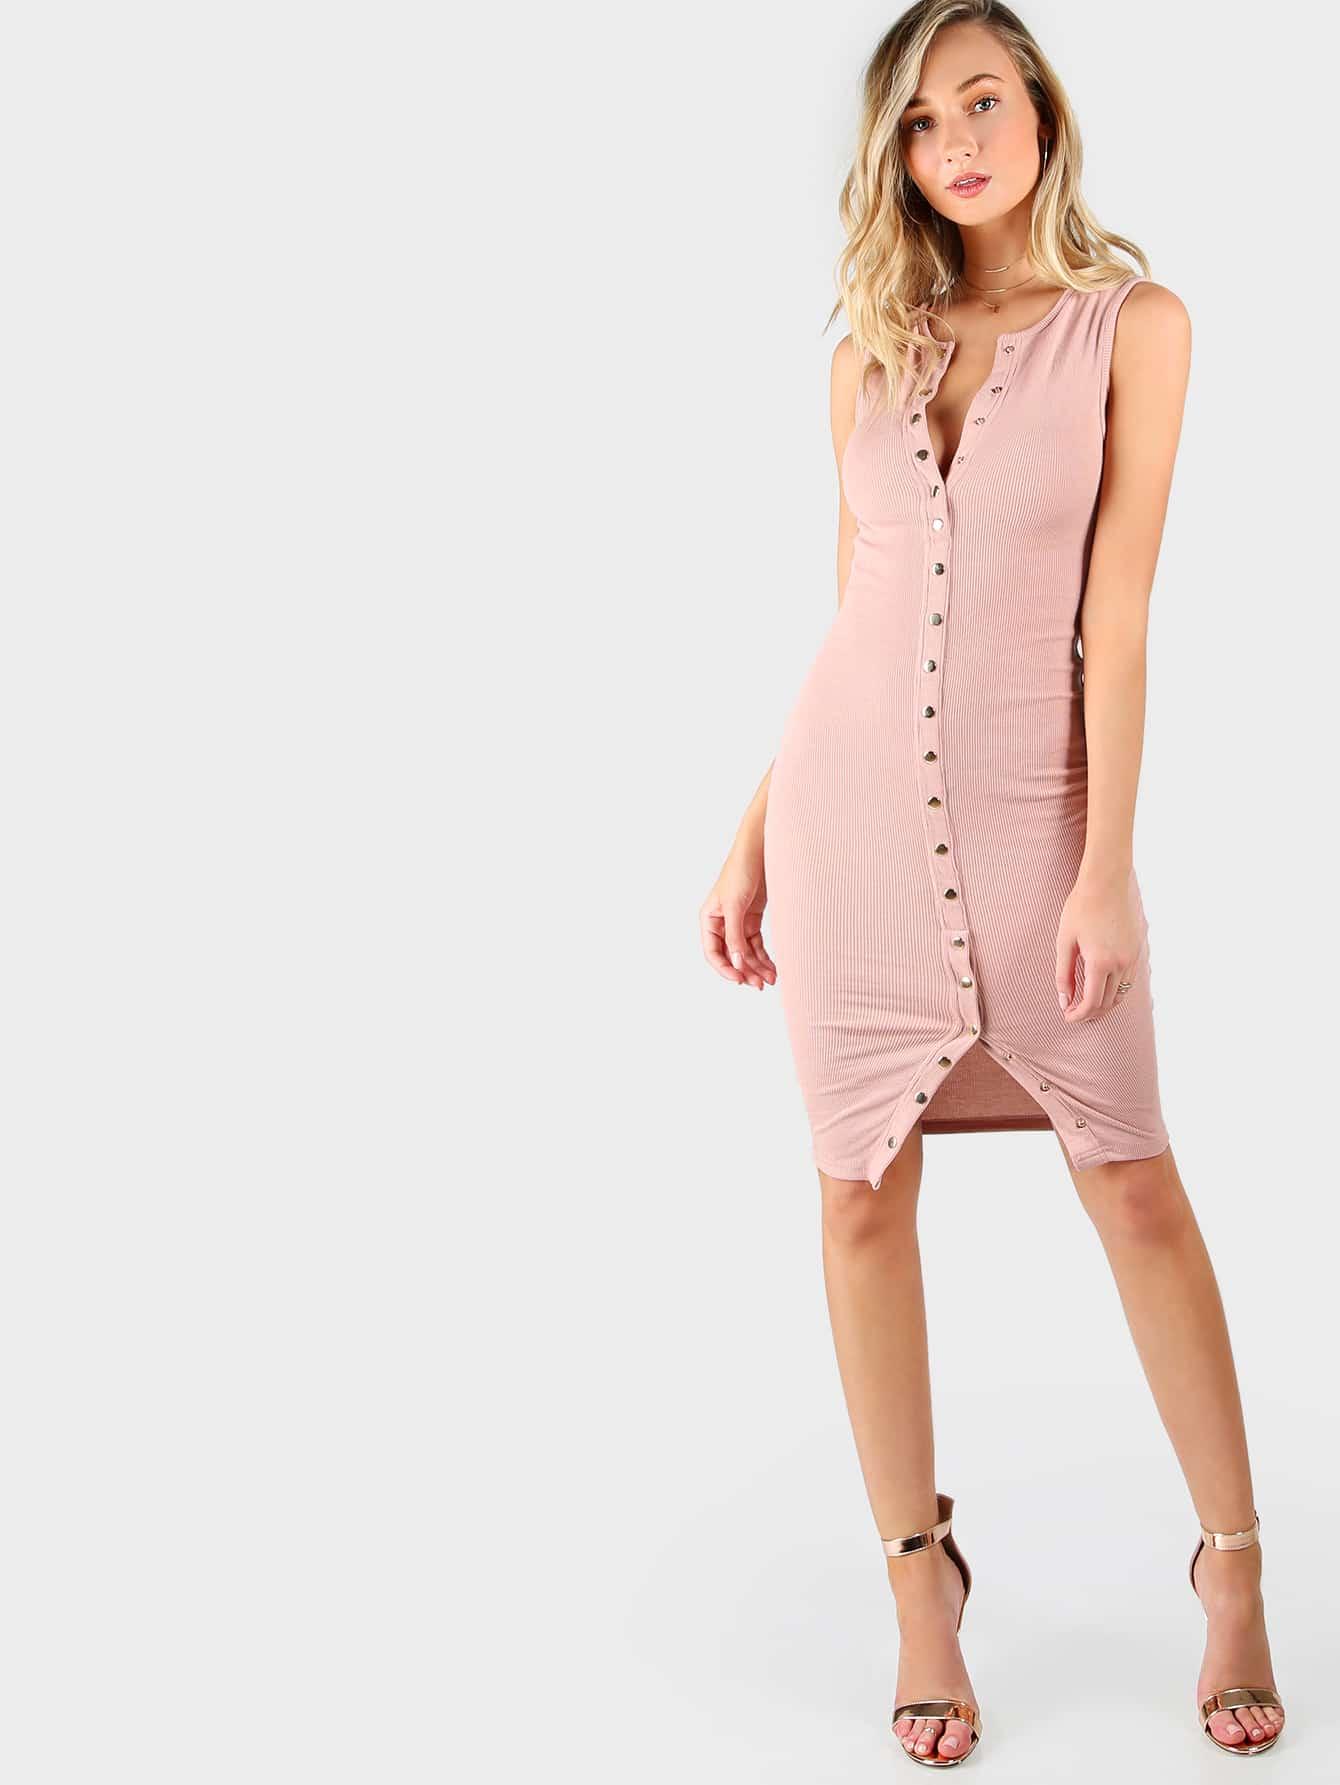 Button Down Ribbed Tank Dress mmcdress-hdd8002-blush